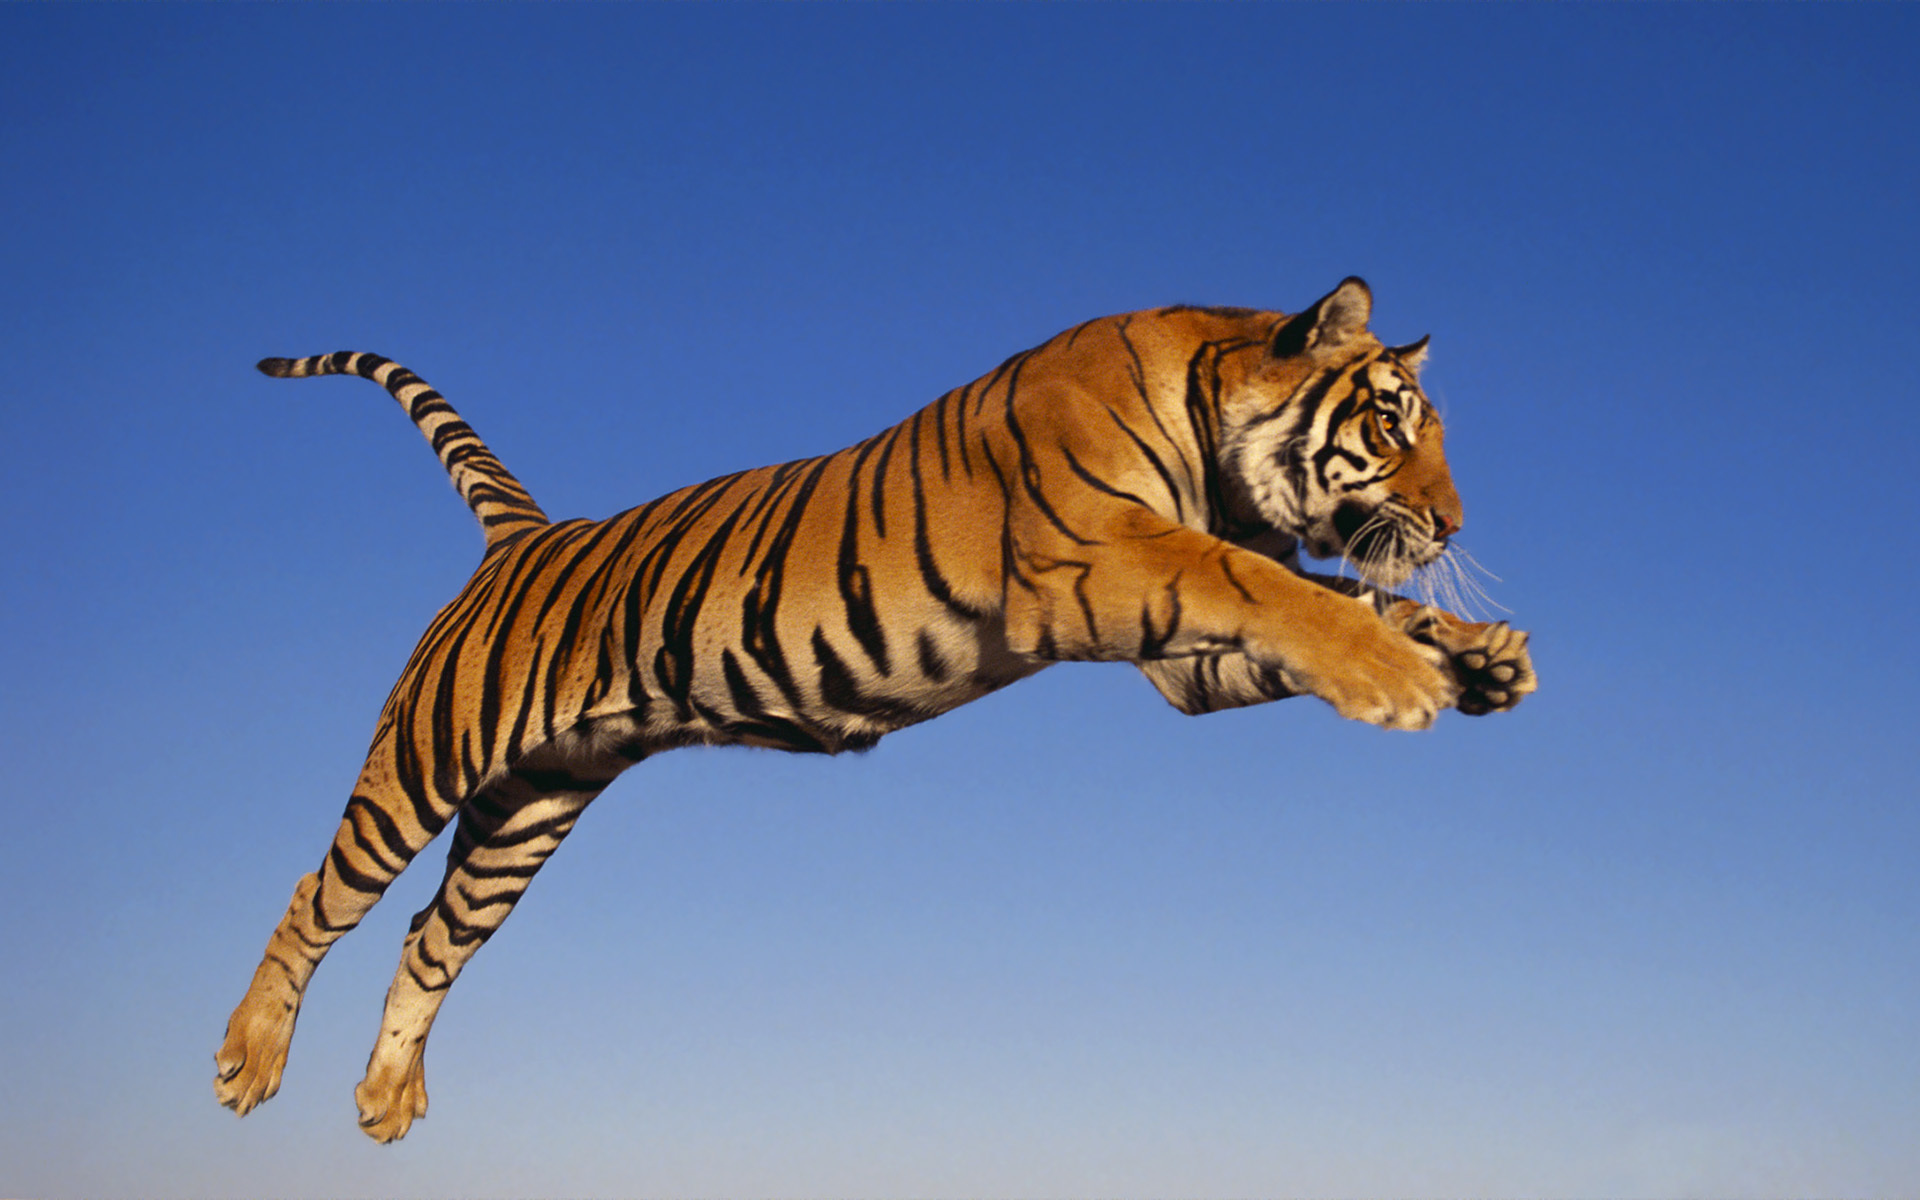 Tiger Backgrounds